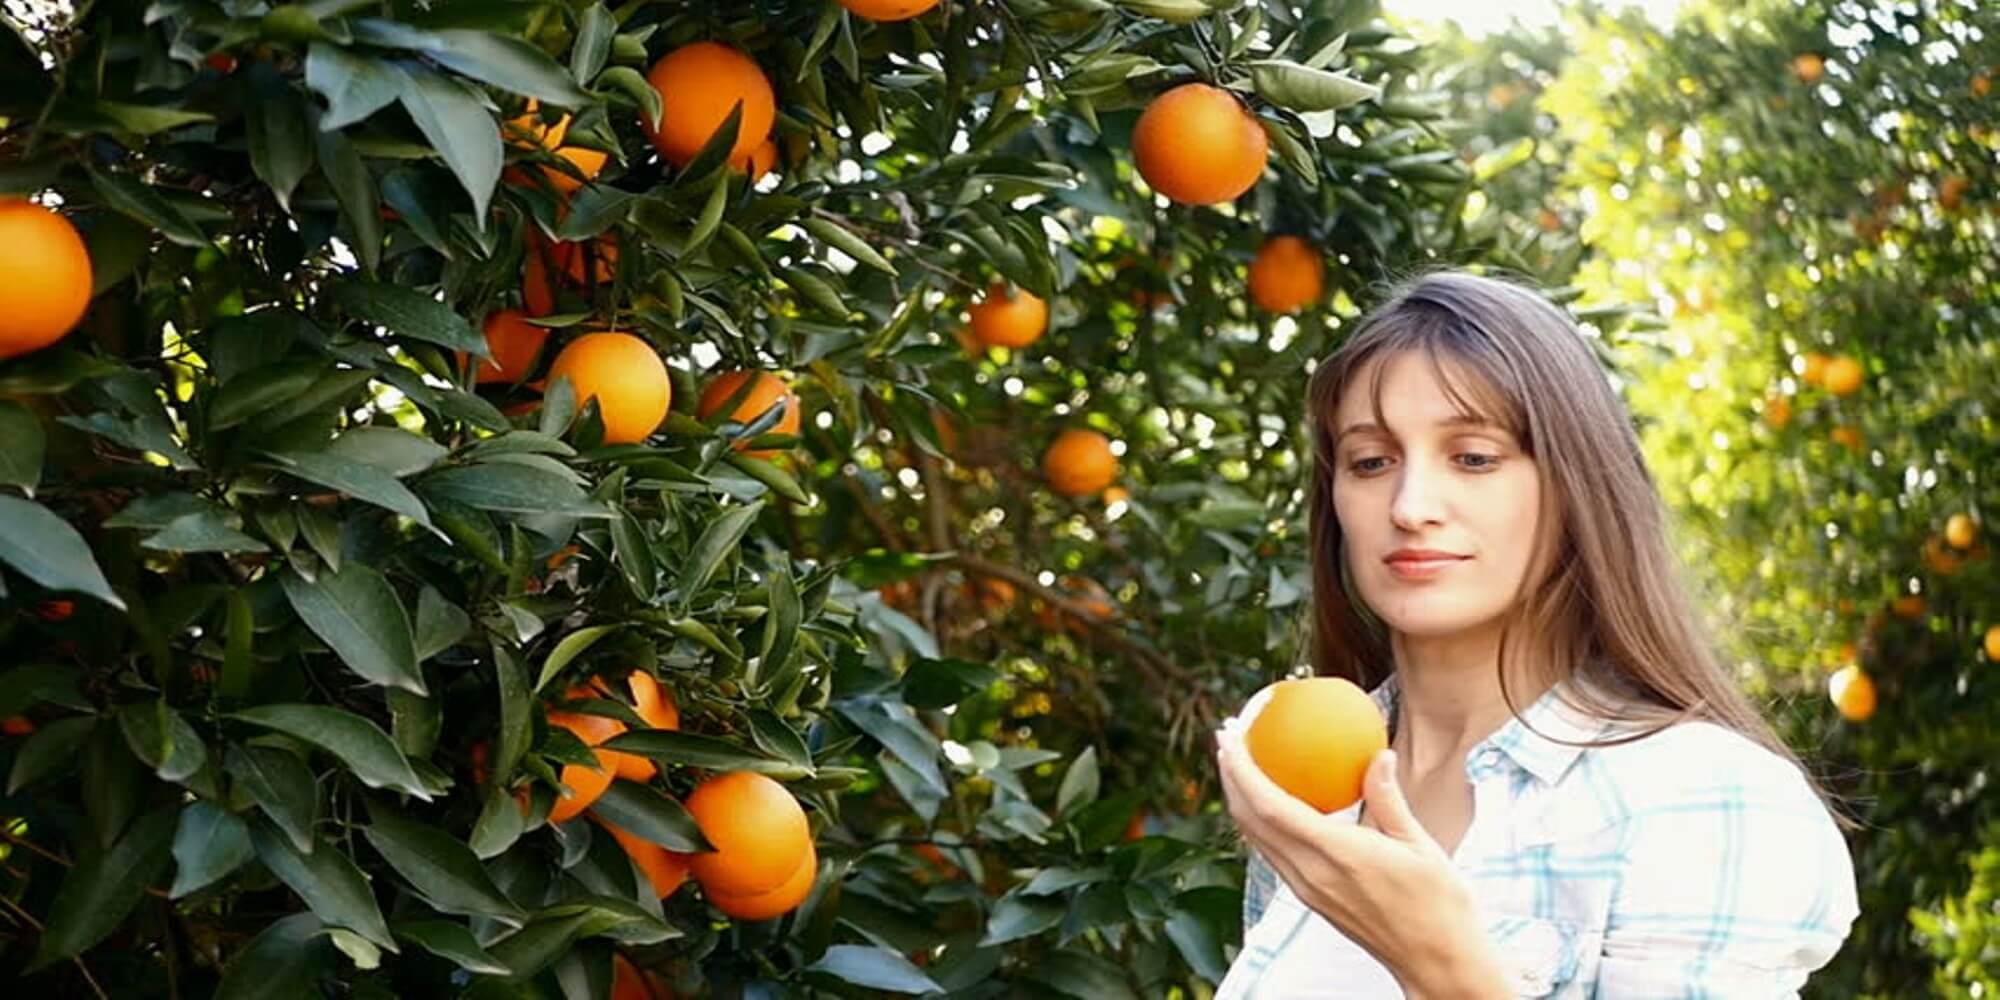 coorg orange image